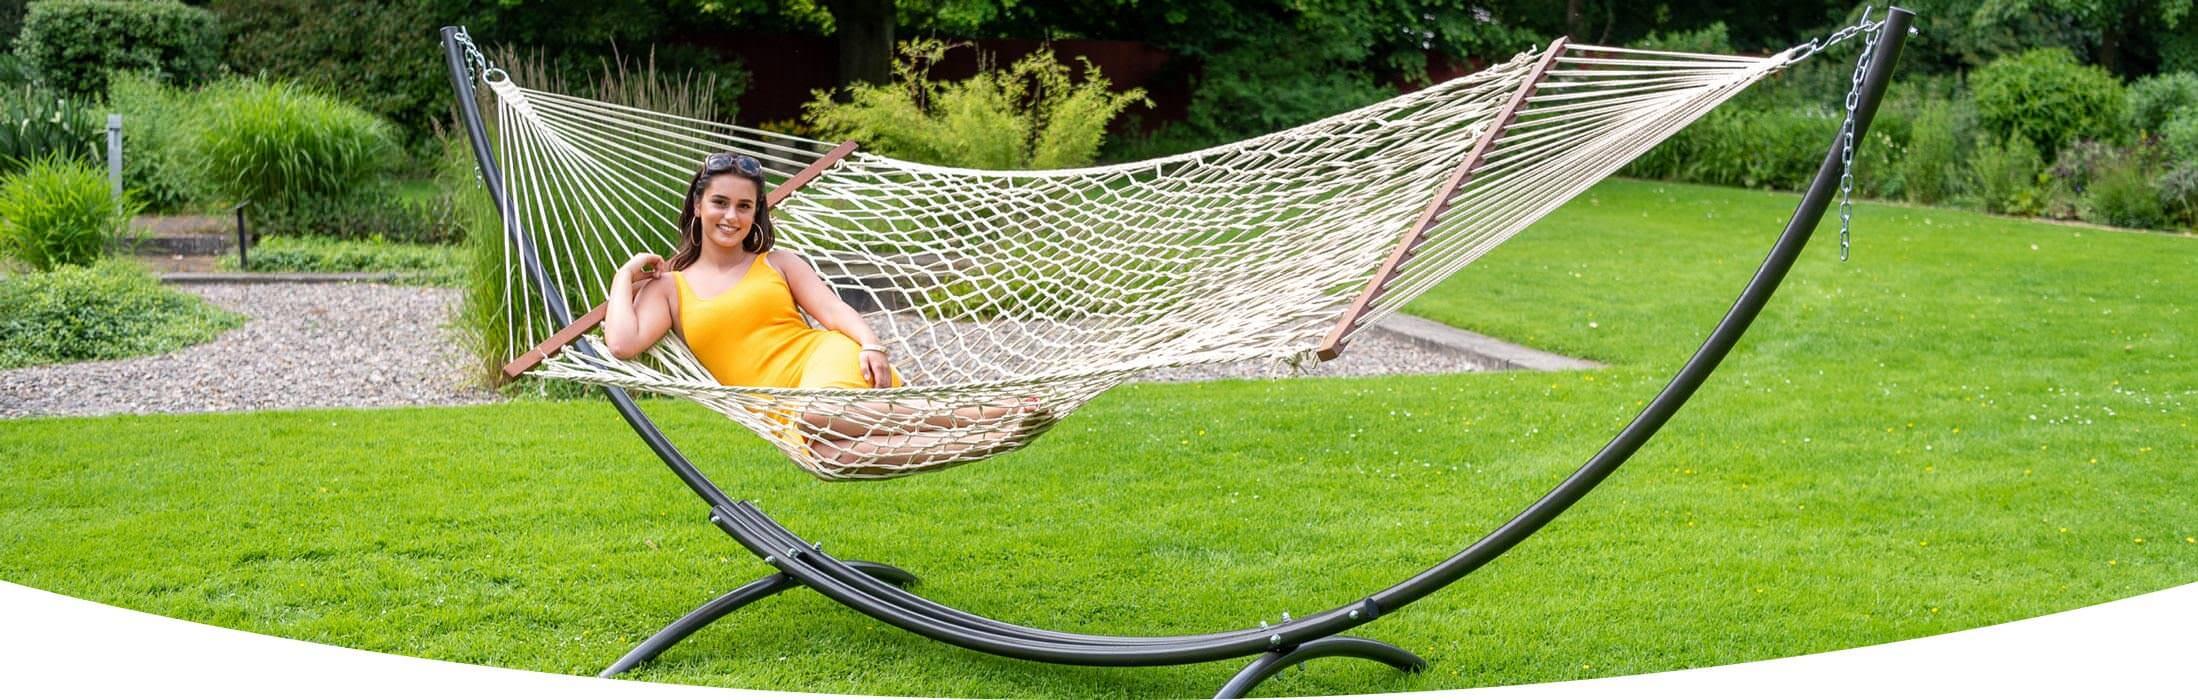 Hammock Rope with hammock stand Arc